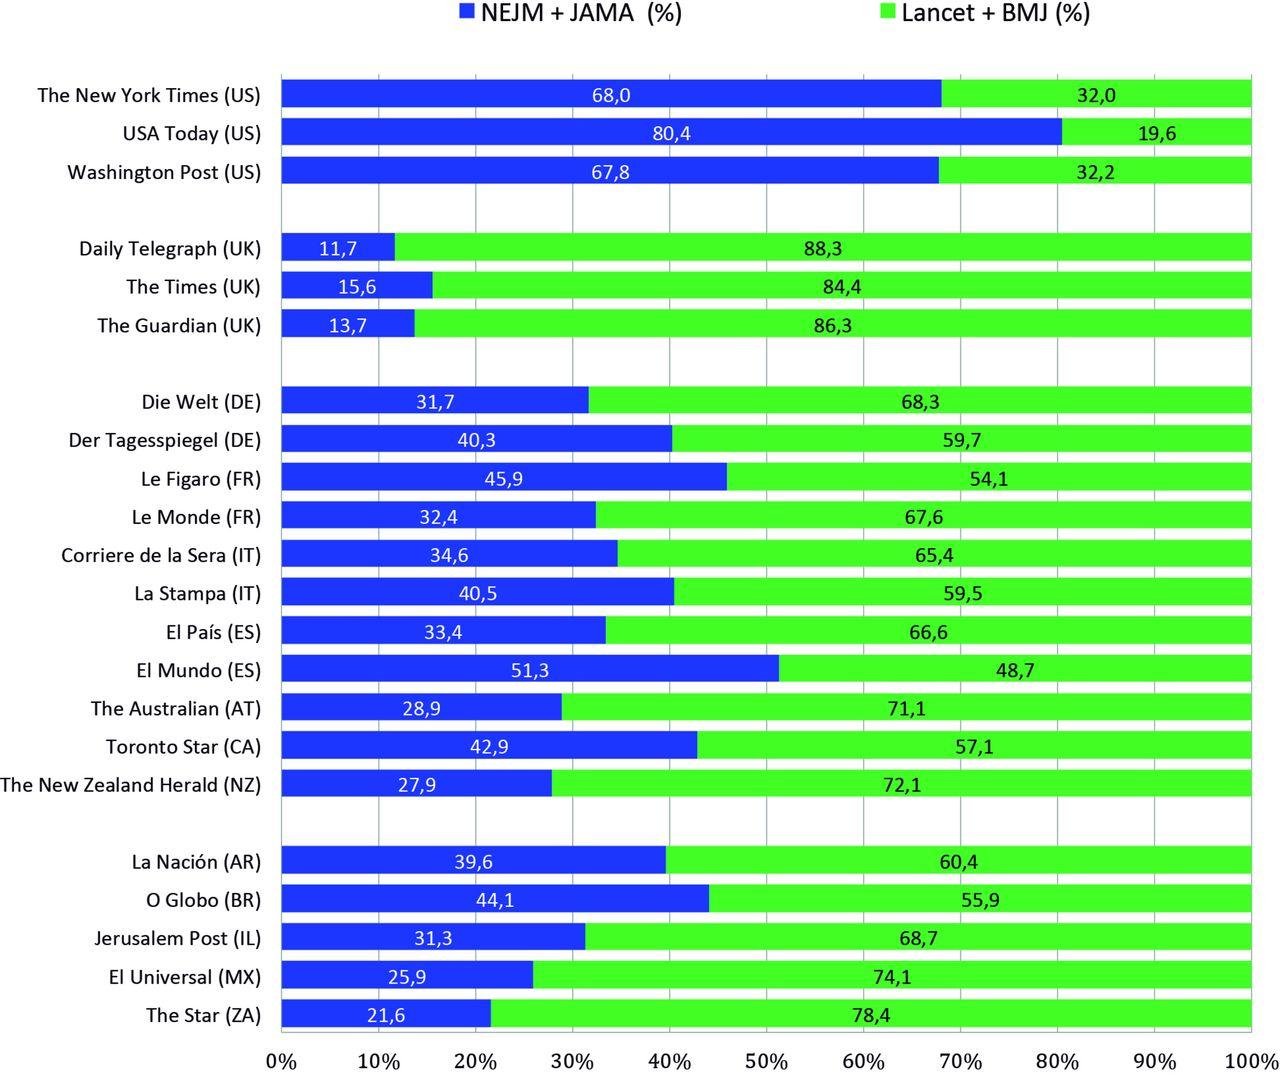 National citation patterns of NEJM, The Lancet, JAMA and The